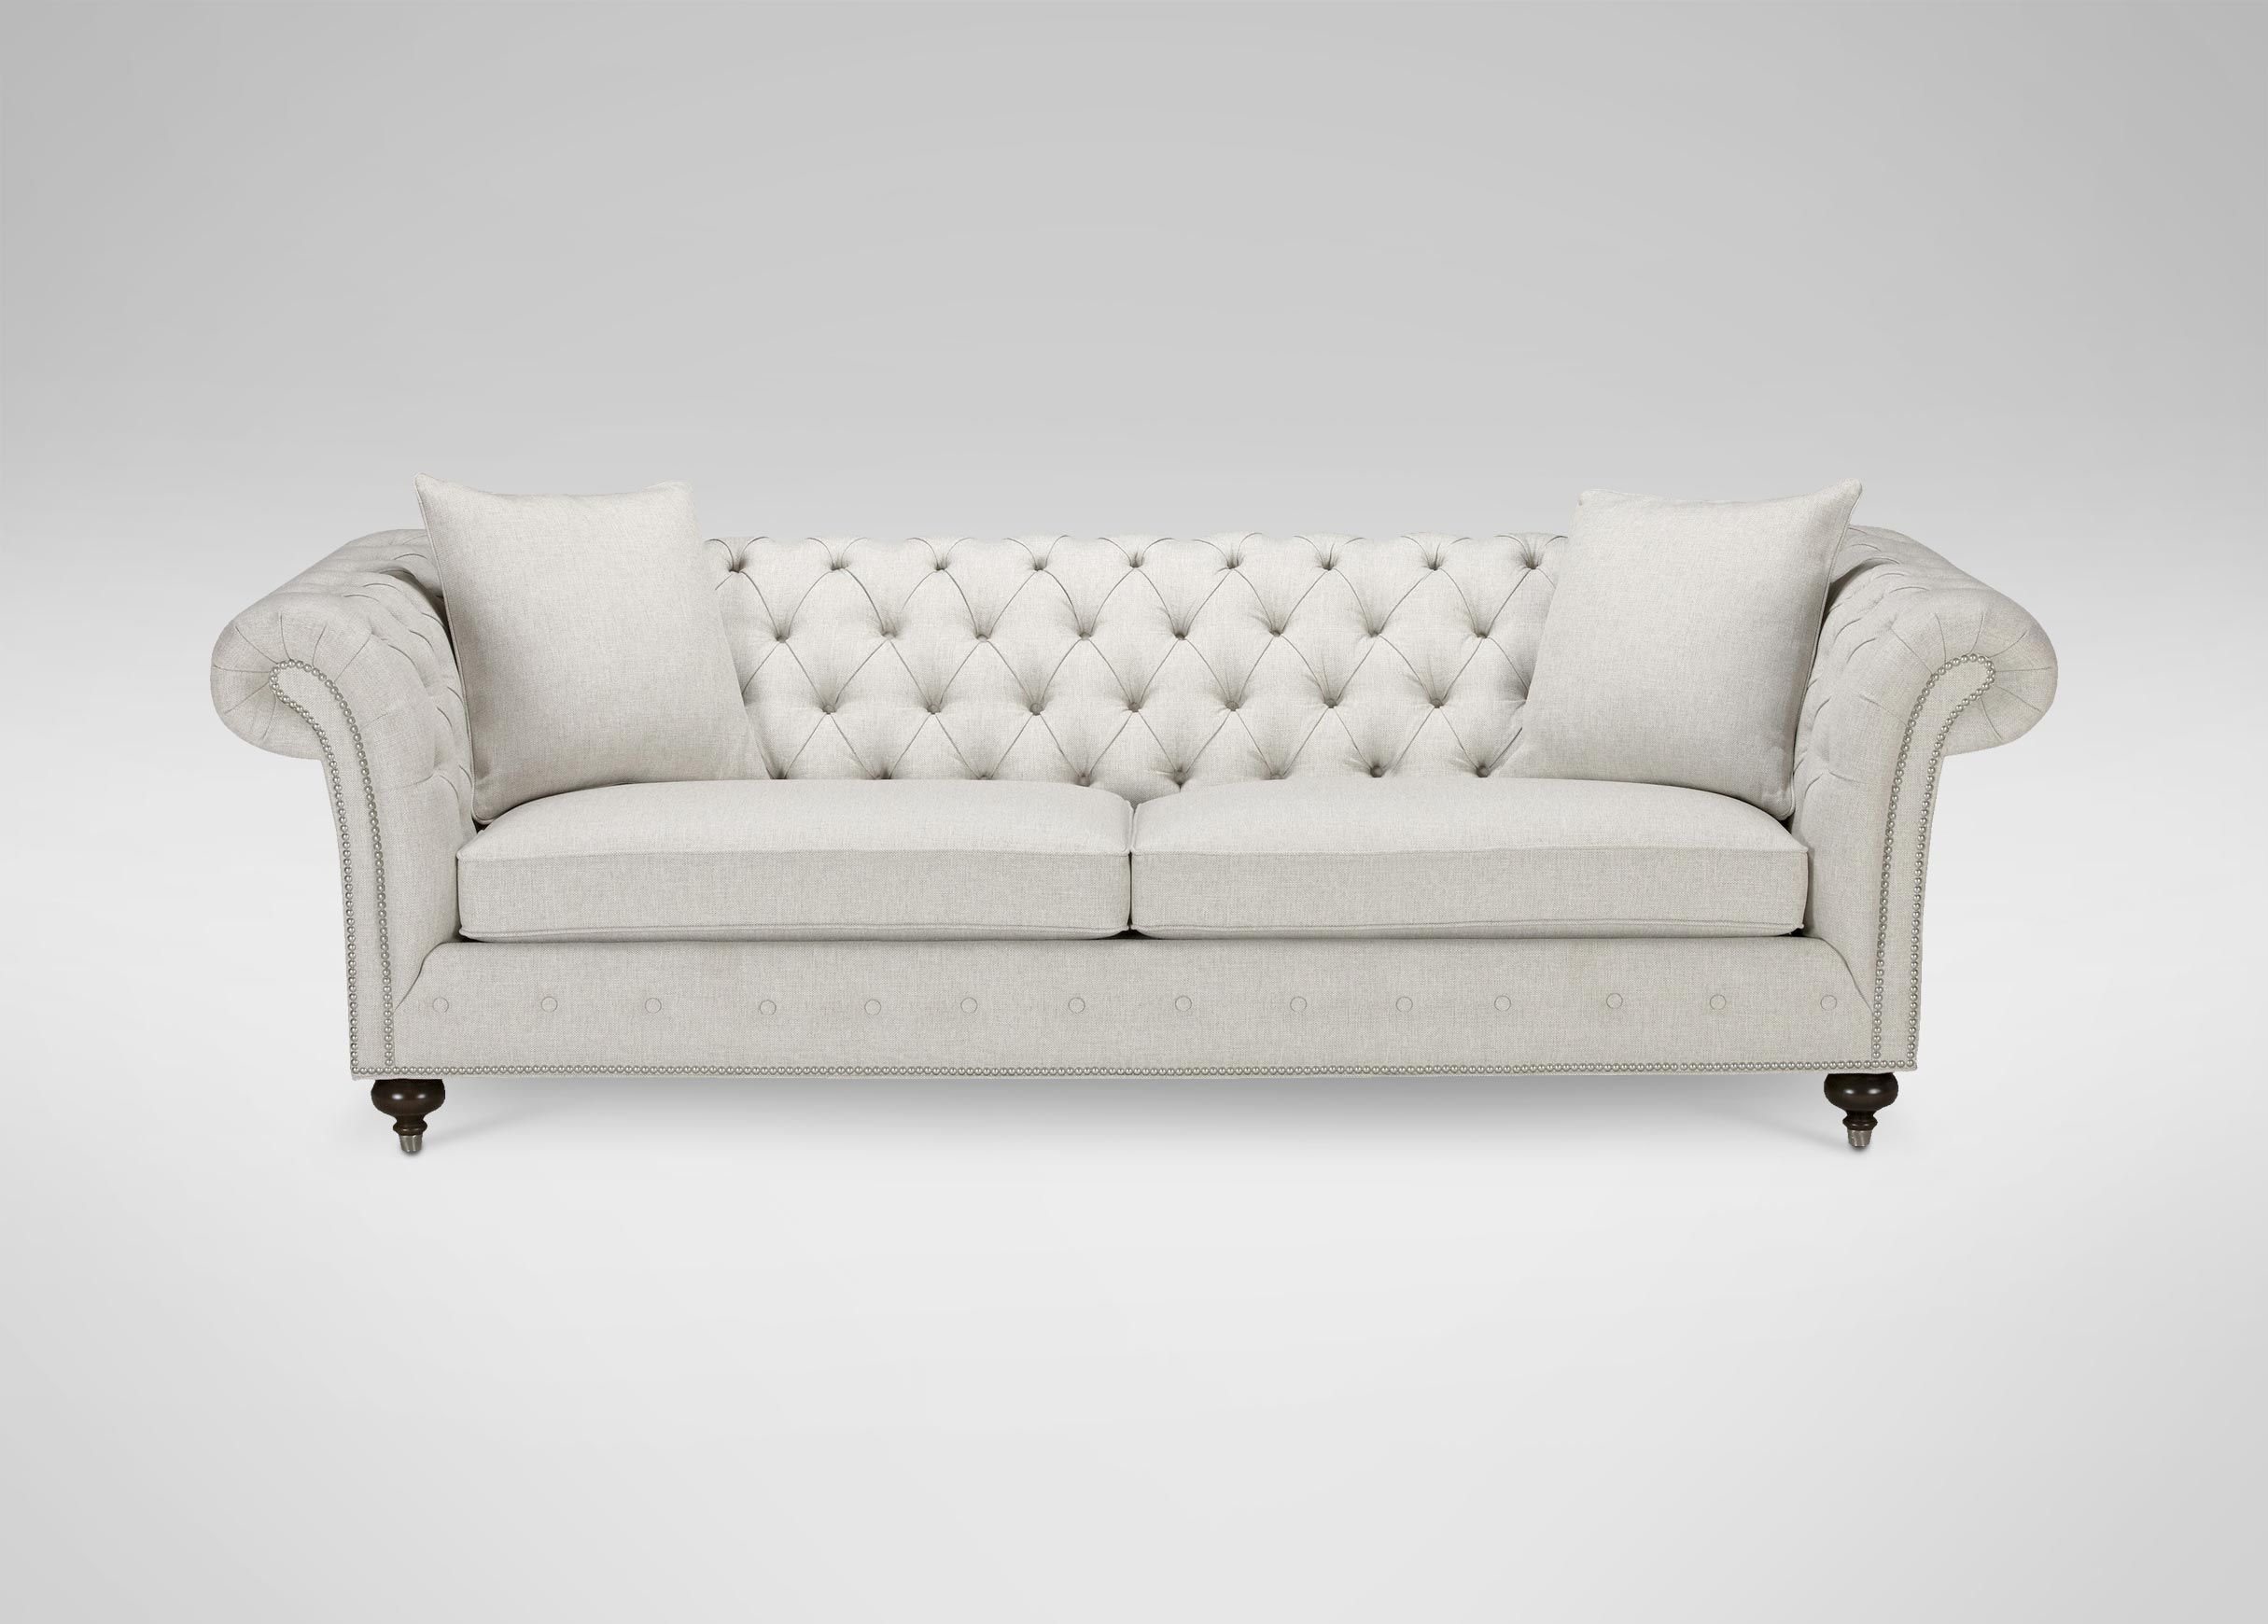 Broyhill Sofa Mansfield Inch Graphite Velvet Sofa